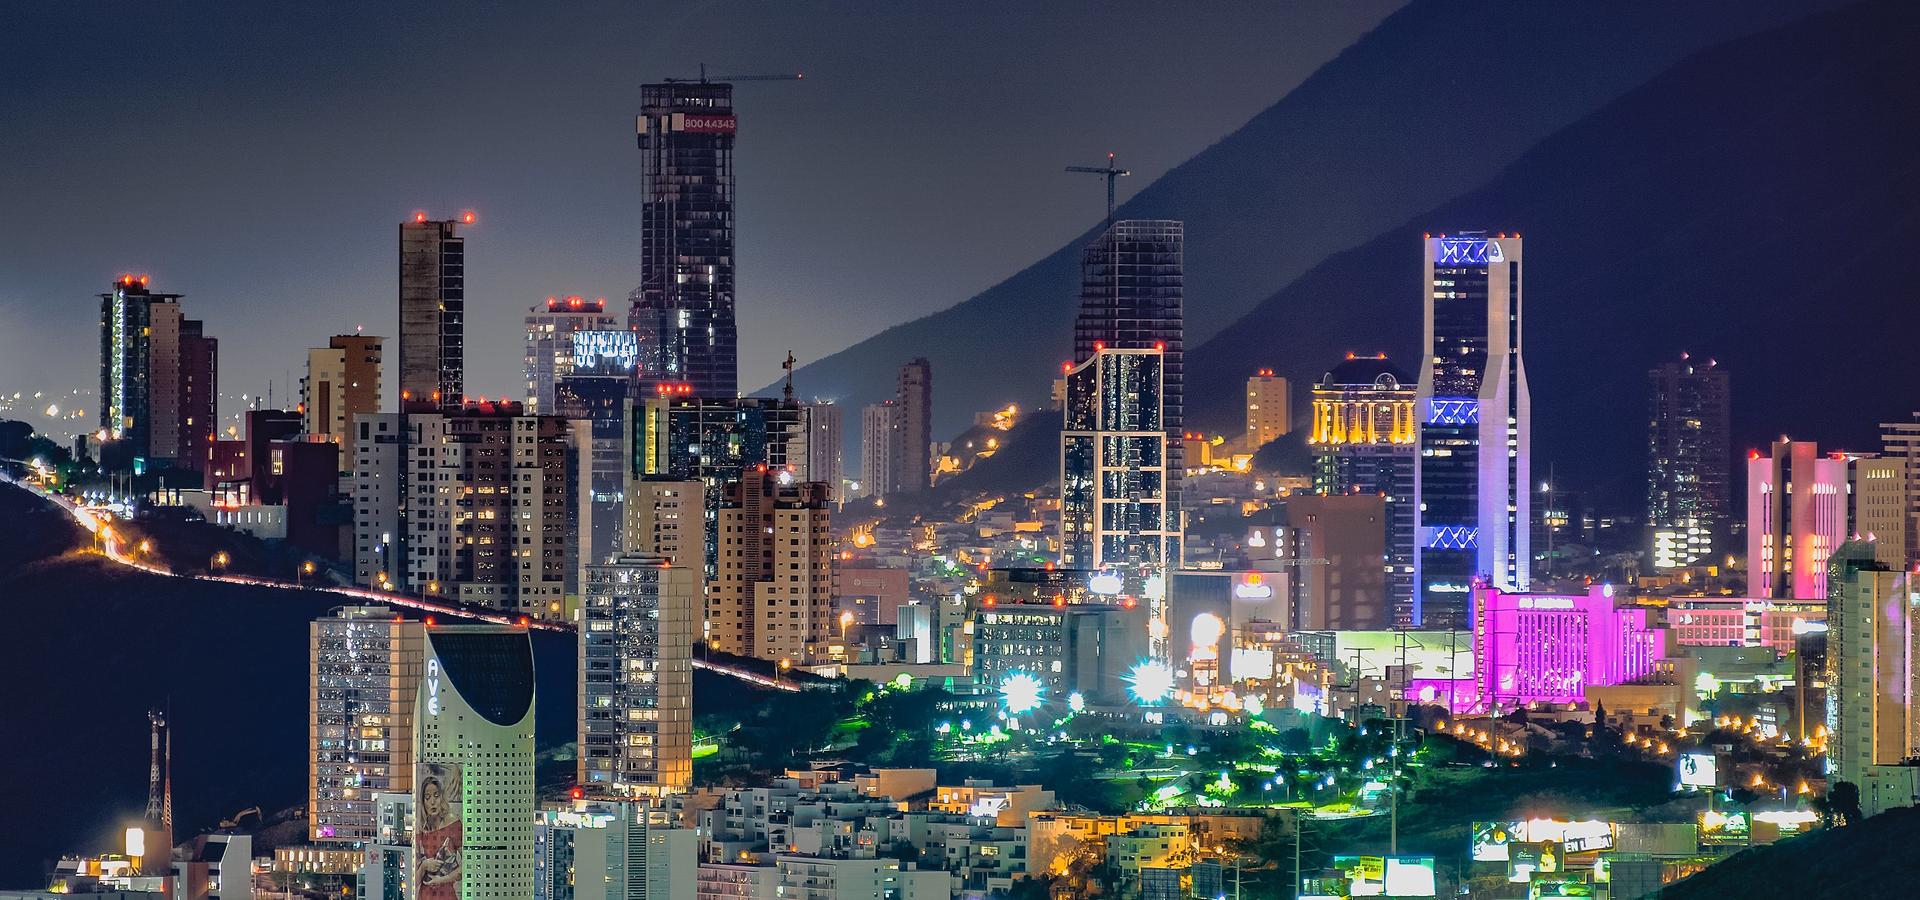 Peer-to-peer advisory in Monterrey, Nuevo León, Mexico